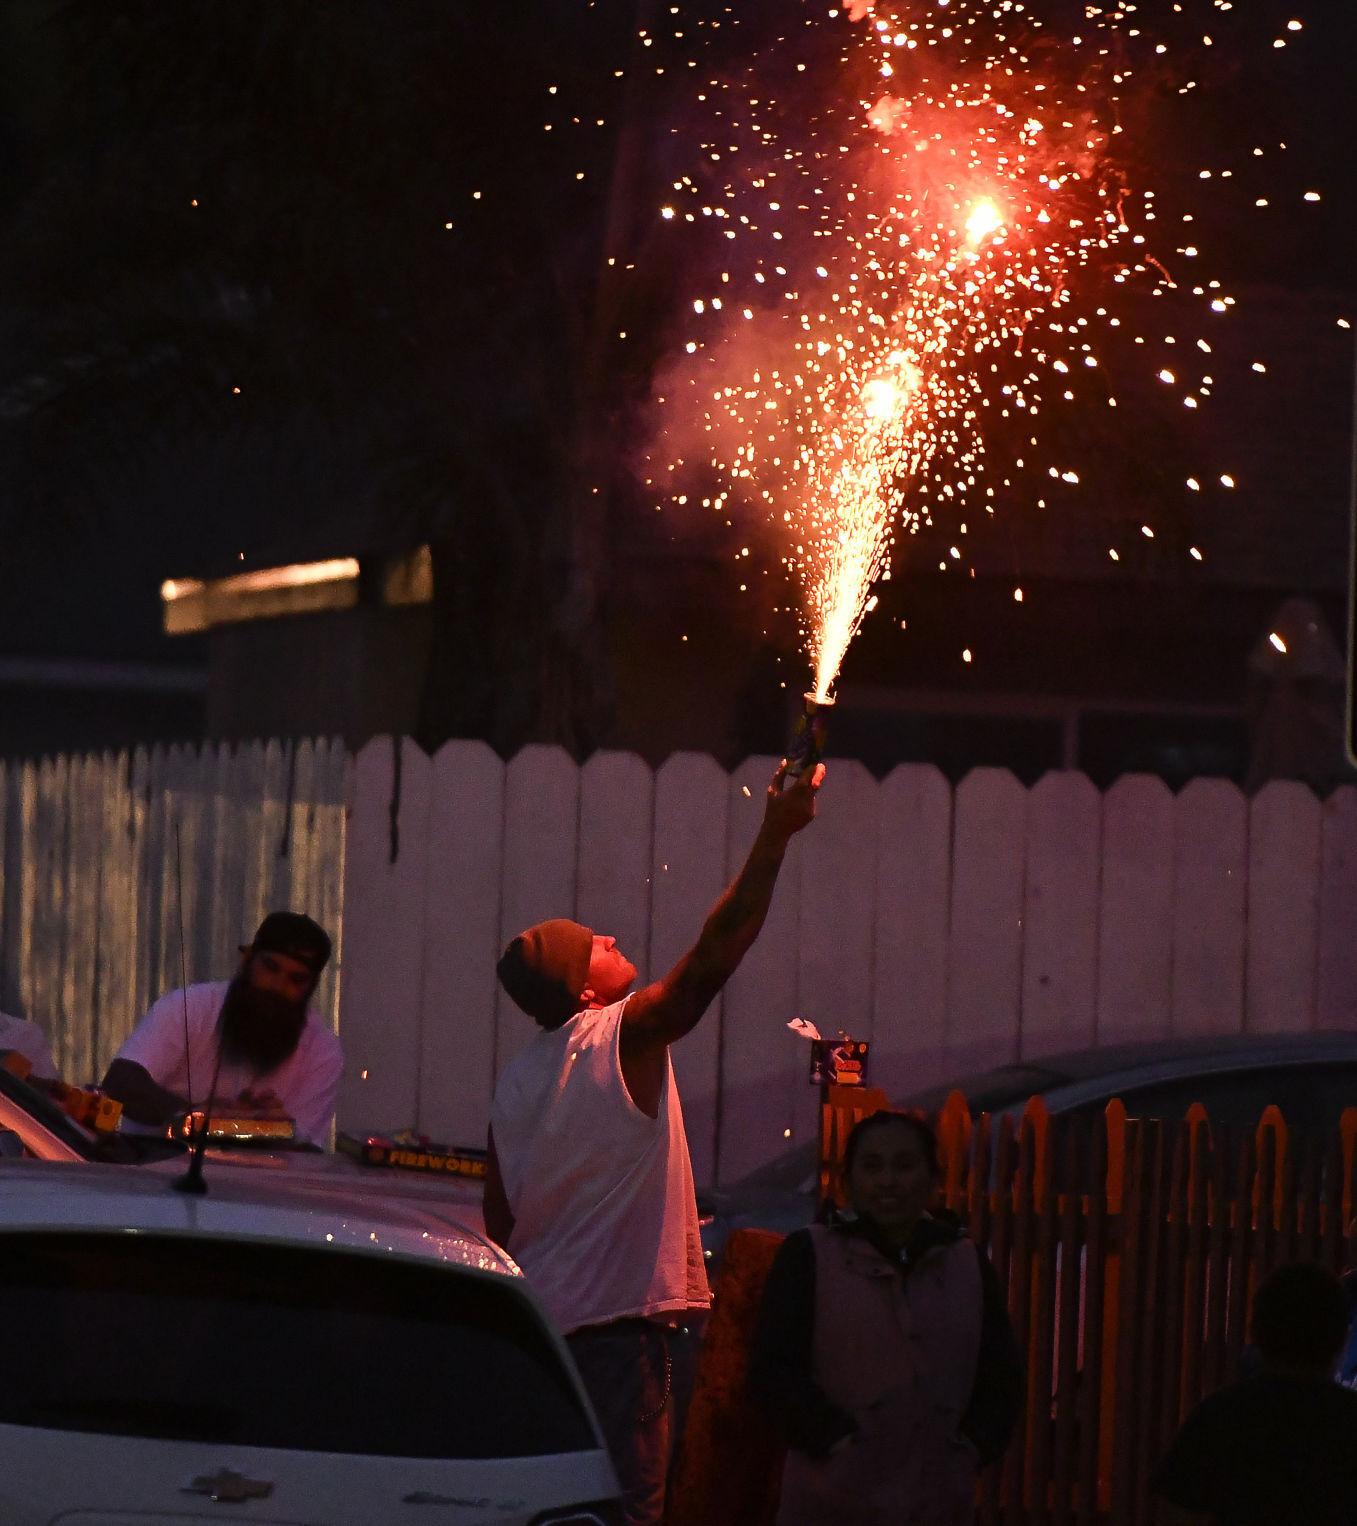 070421 Lompoc fireworks 02.JPG